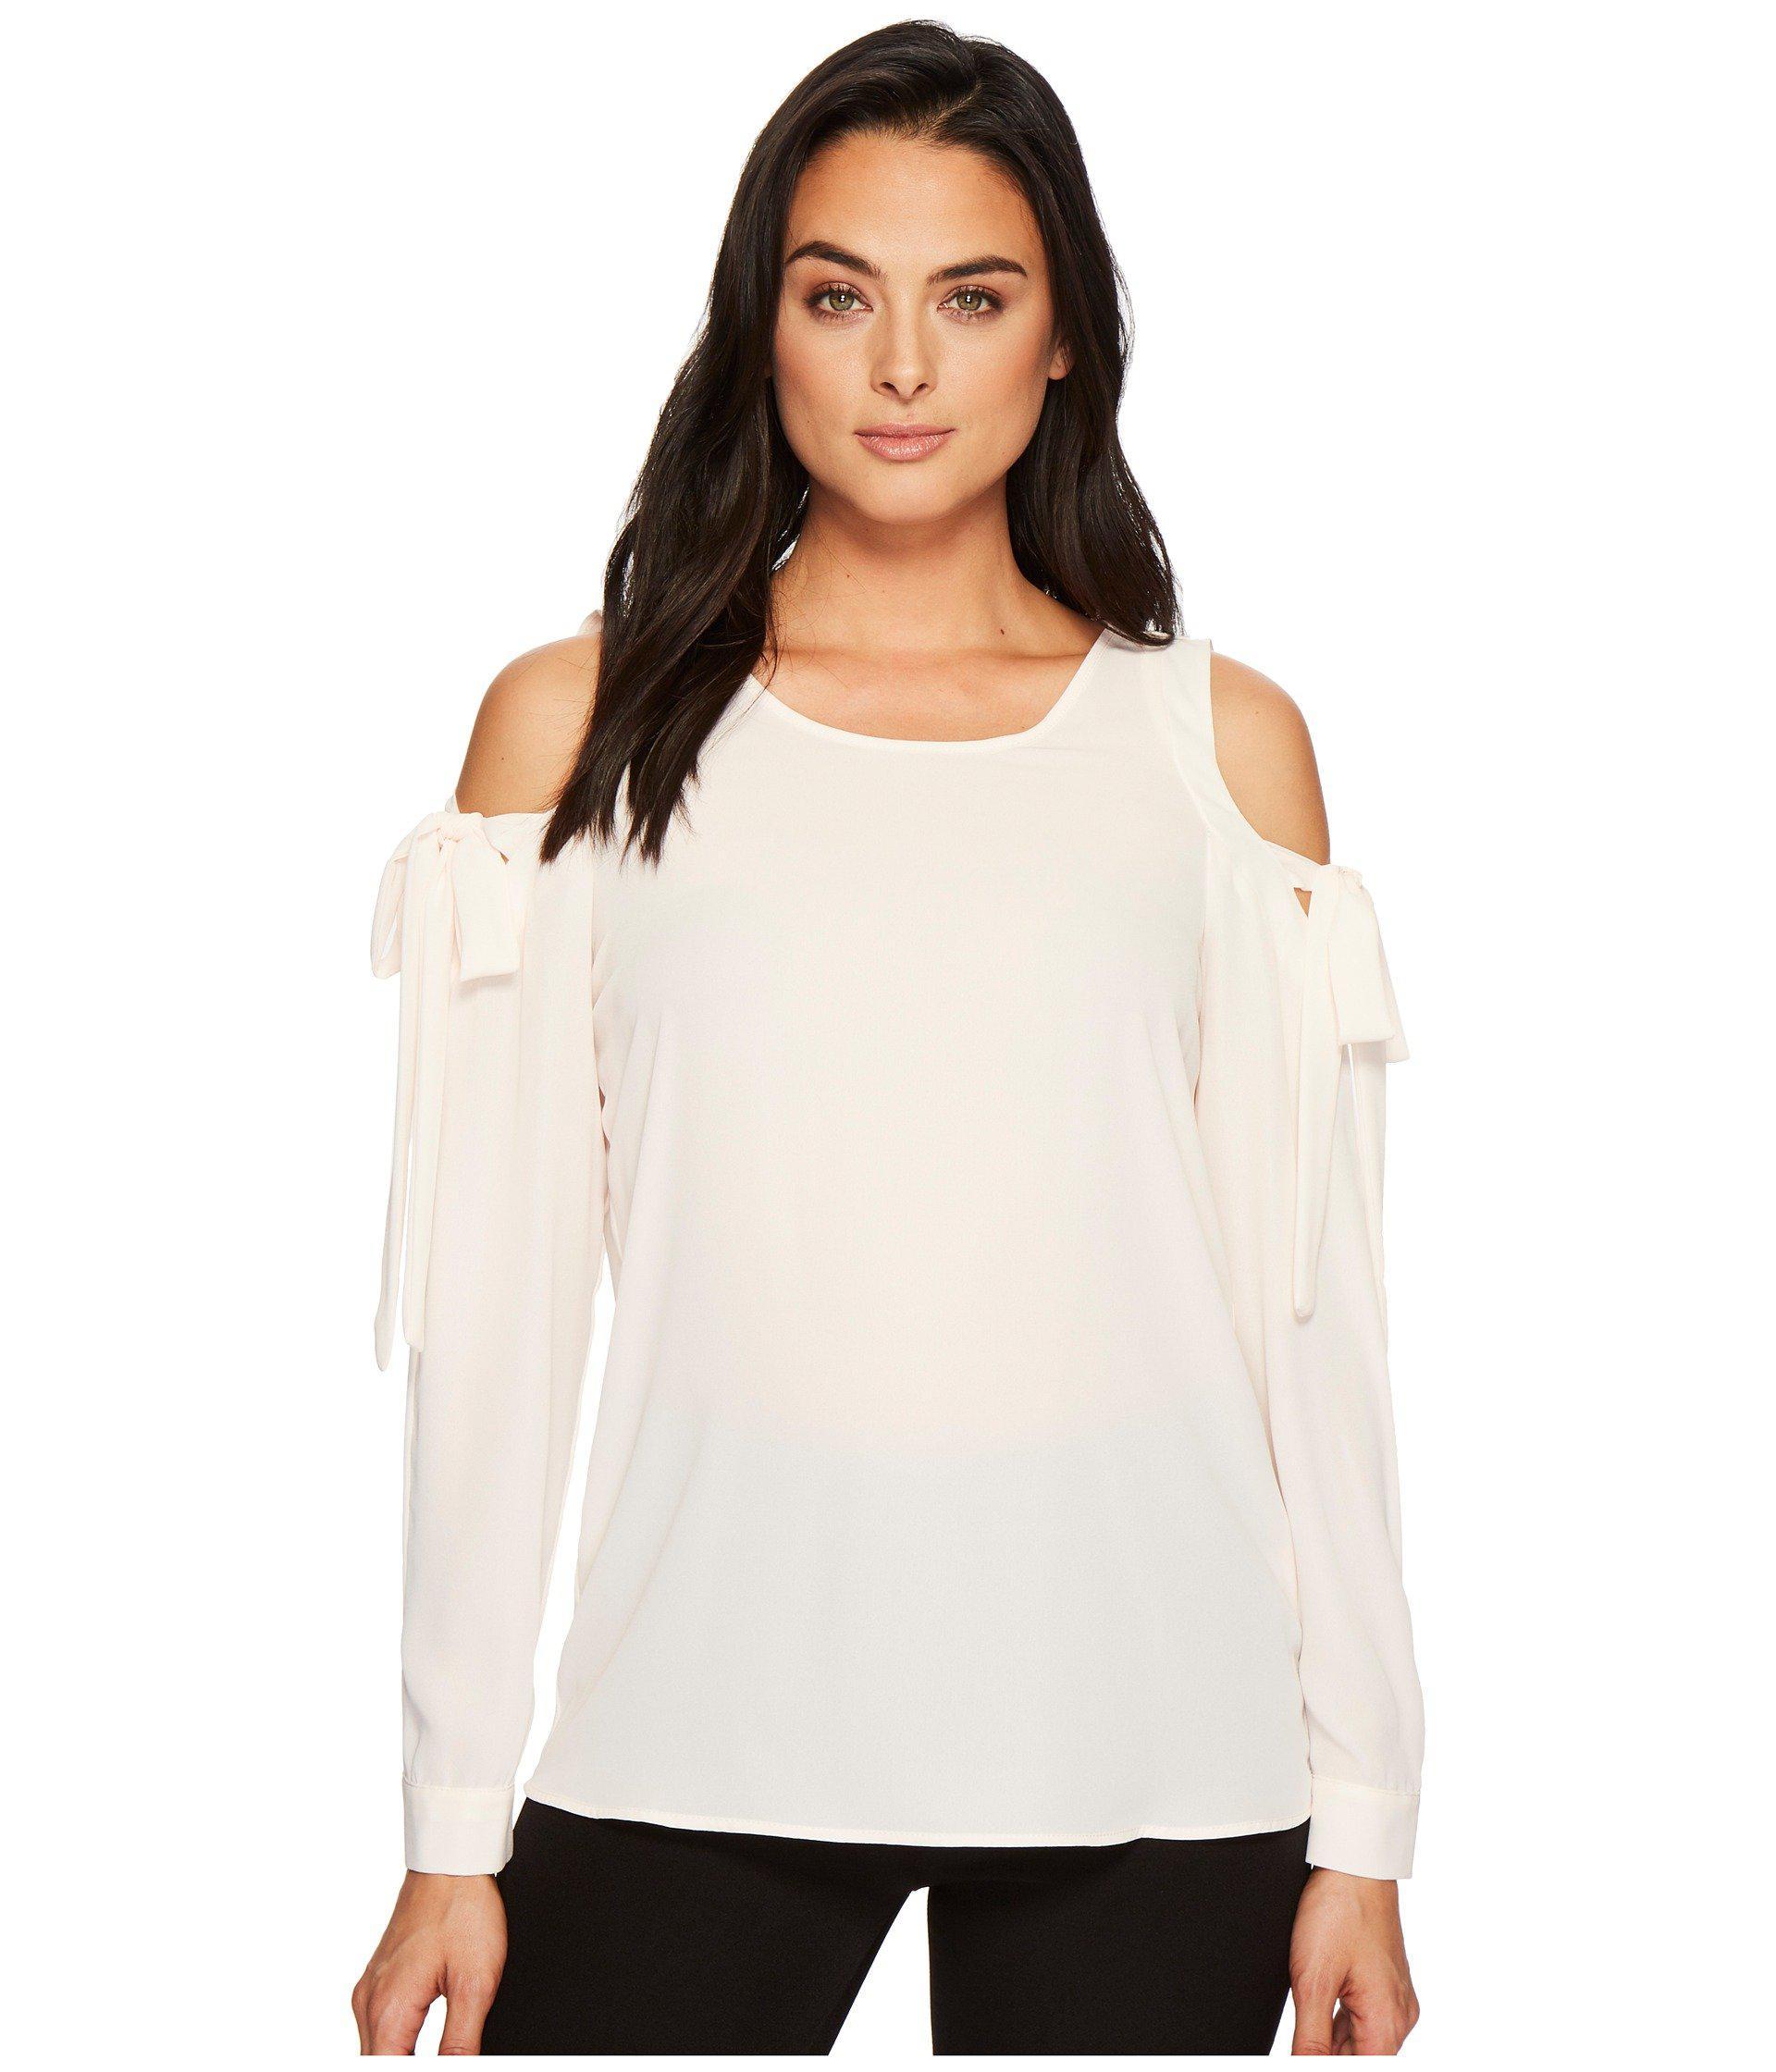 6b018ba97d479 Lyst - Ivanka Trump Woven Cold Shoulder Tie Sleeve Blouse - Save 45%